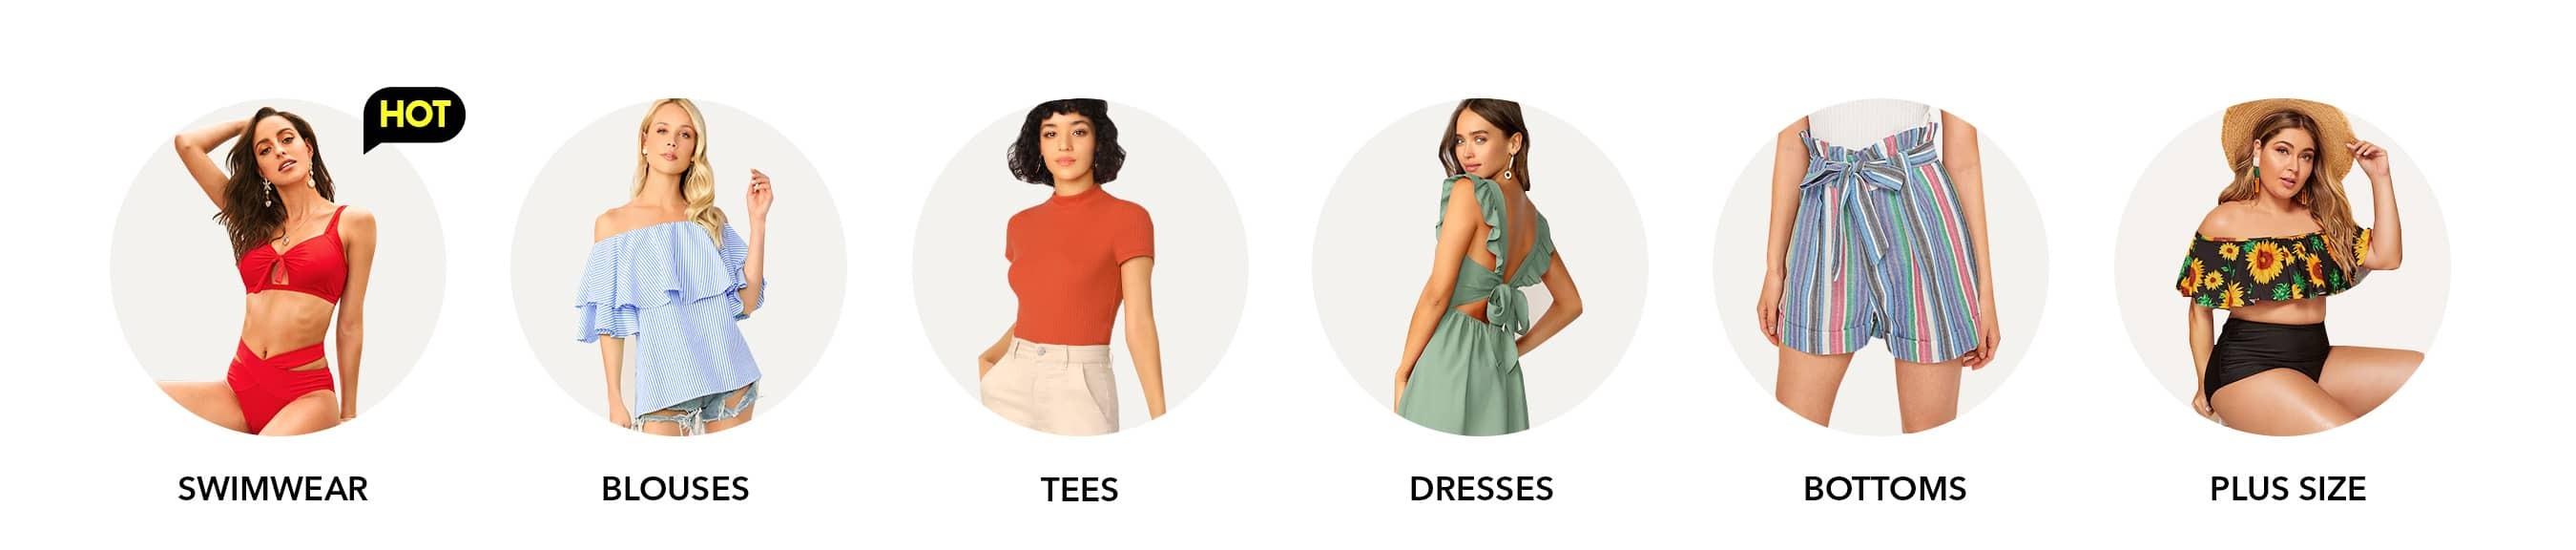 ee6f9c2499ee8 Shop Trendy Women's Fashion   SHEIN